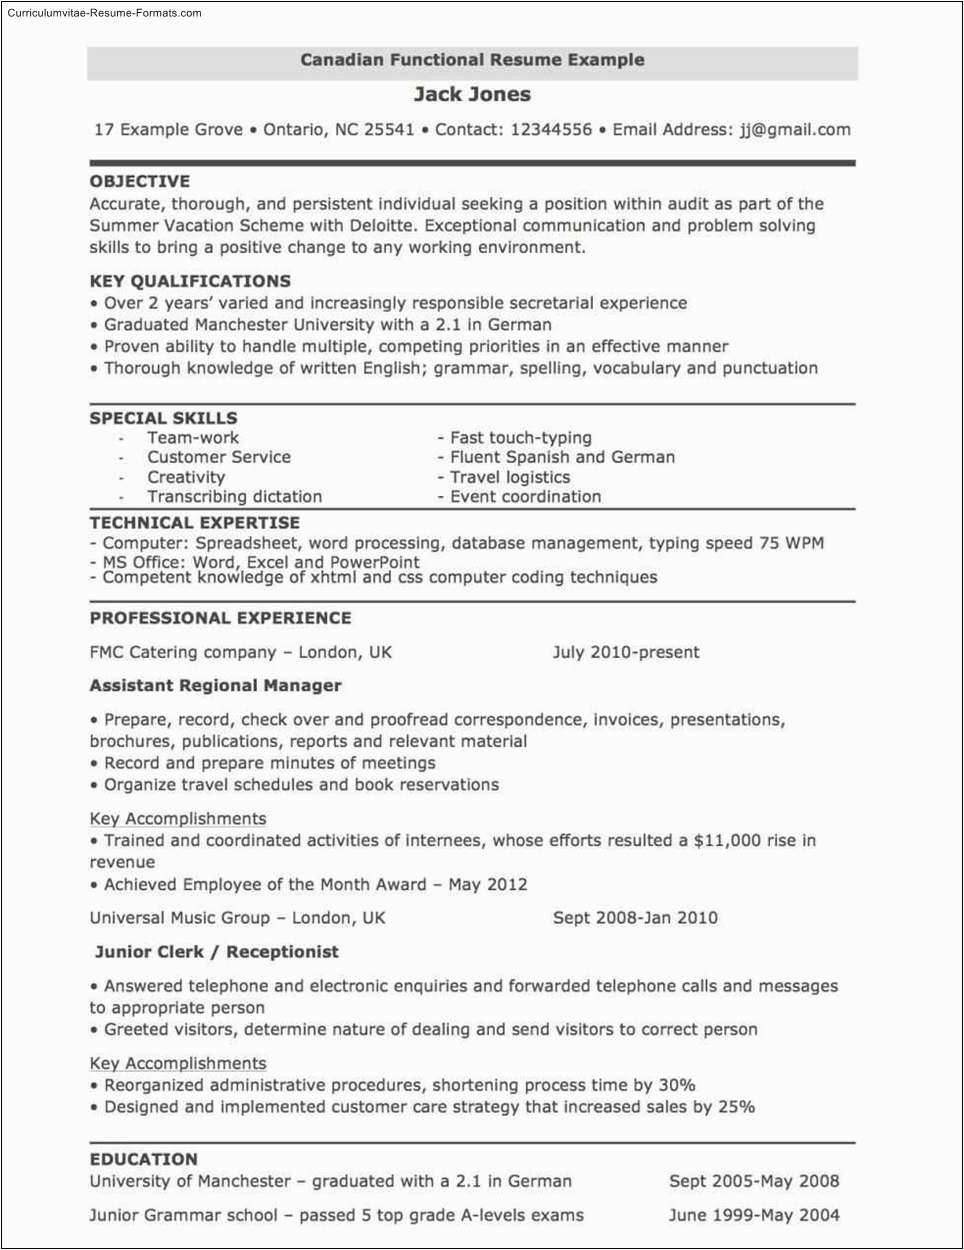 canada resume template